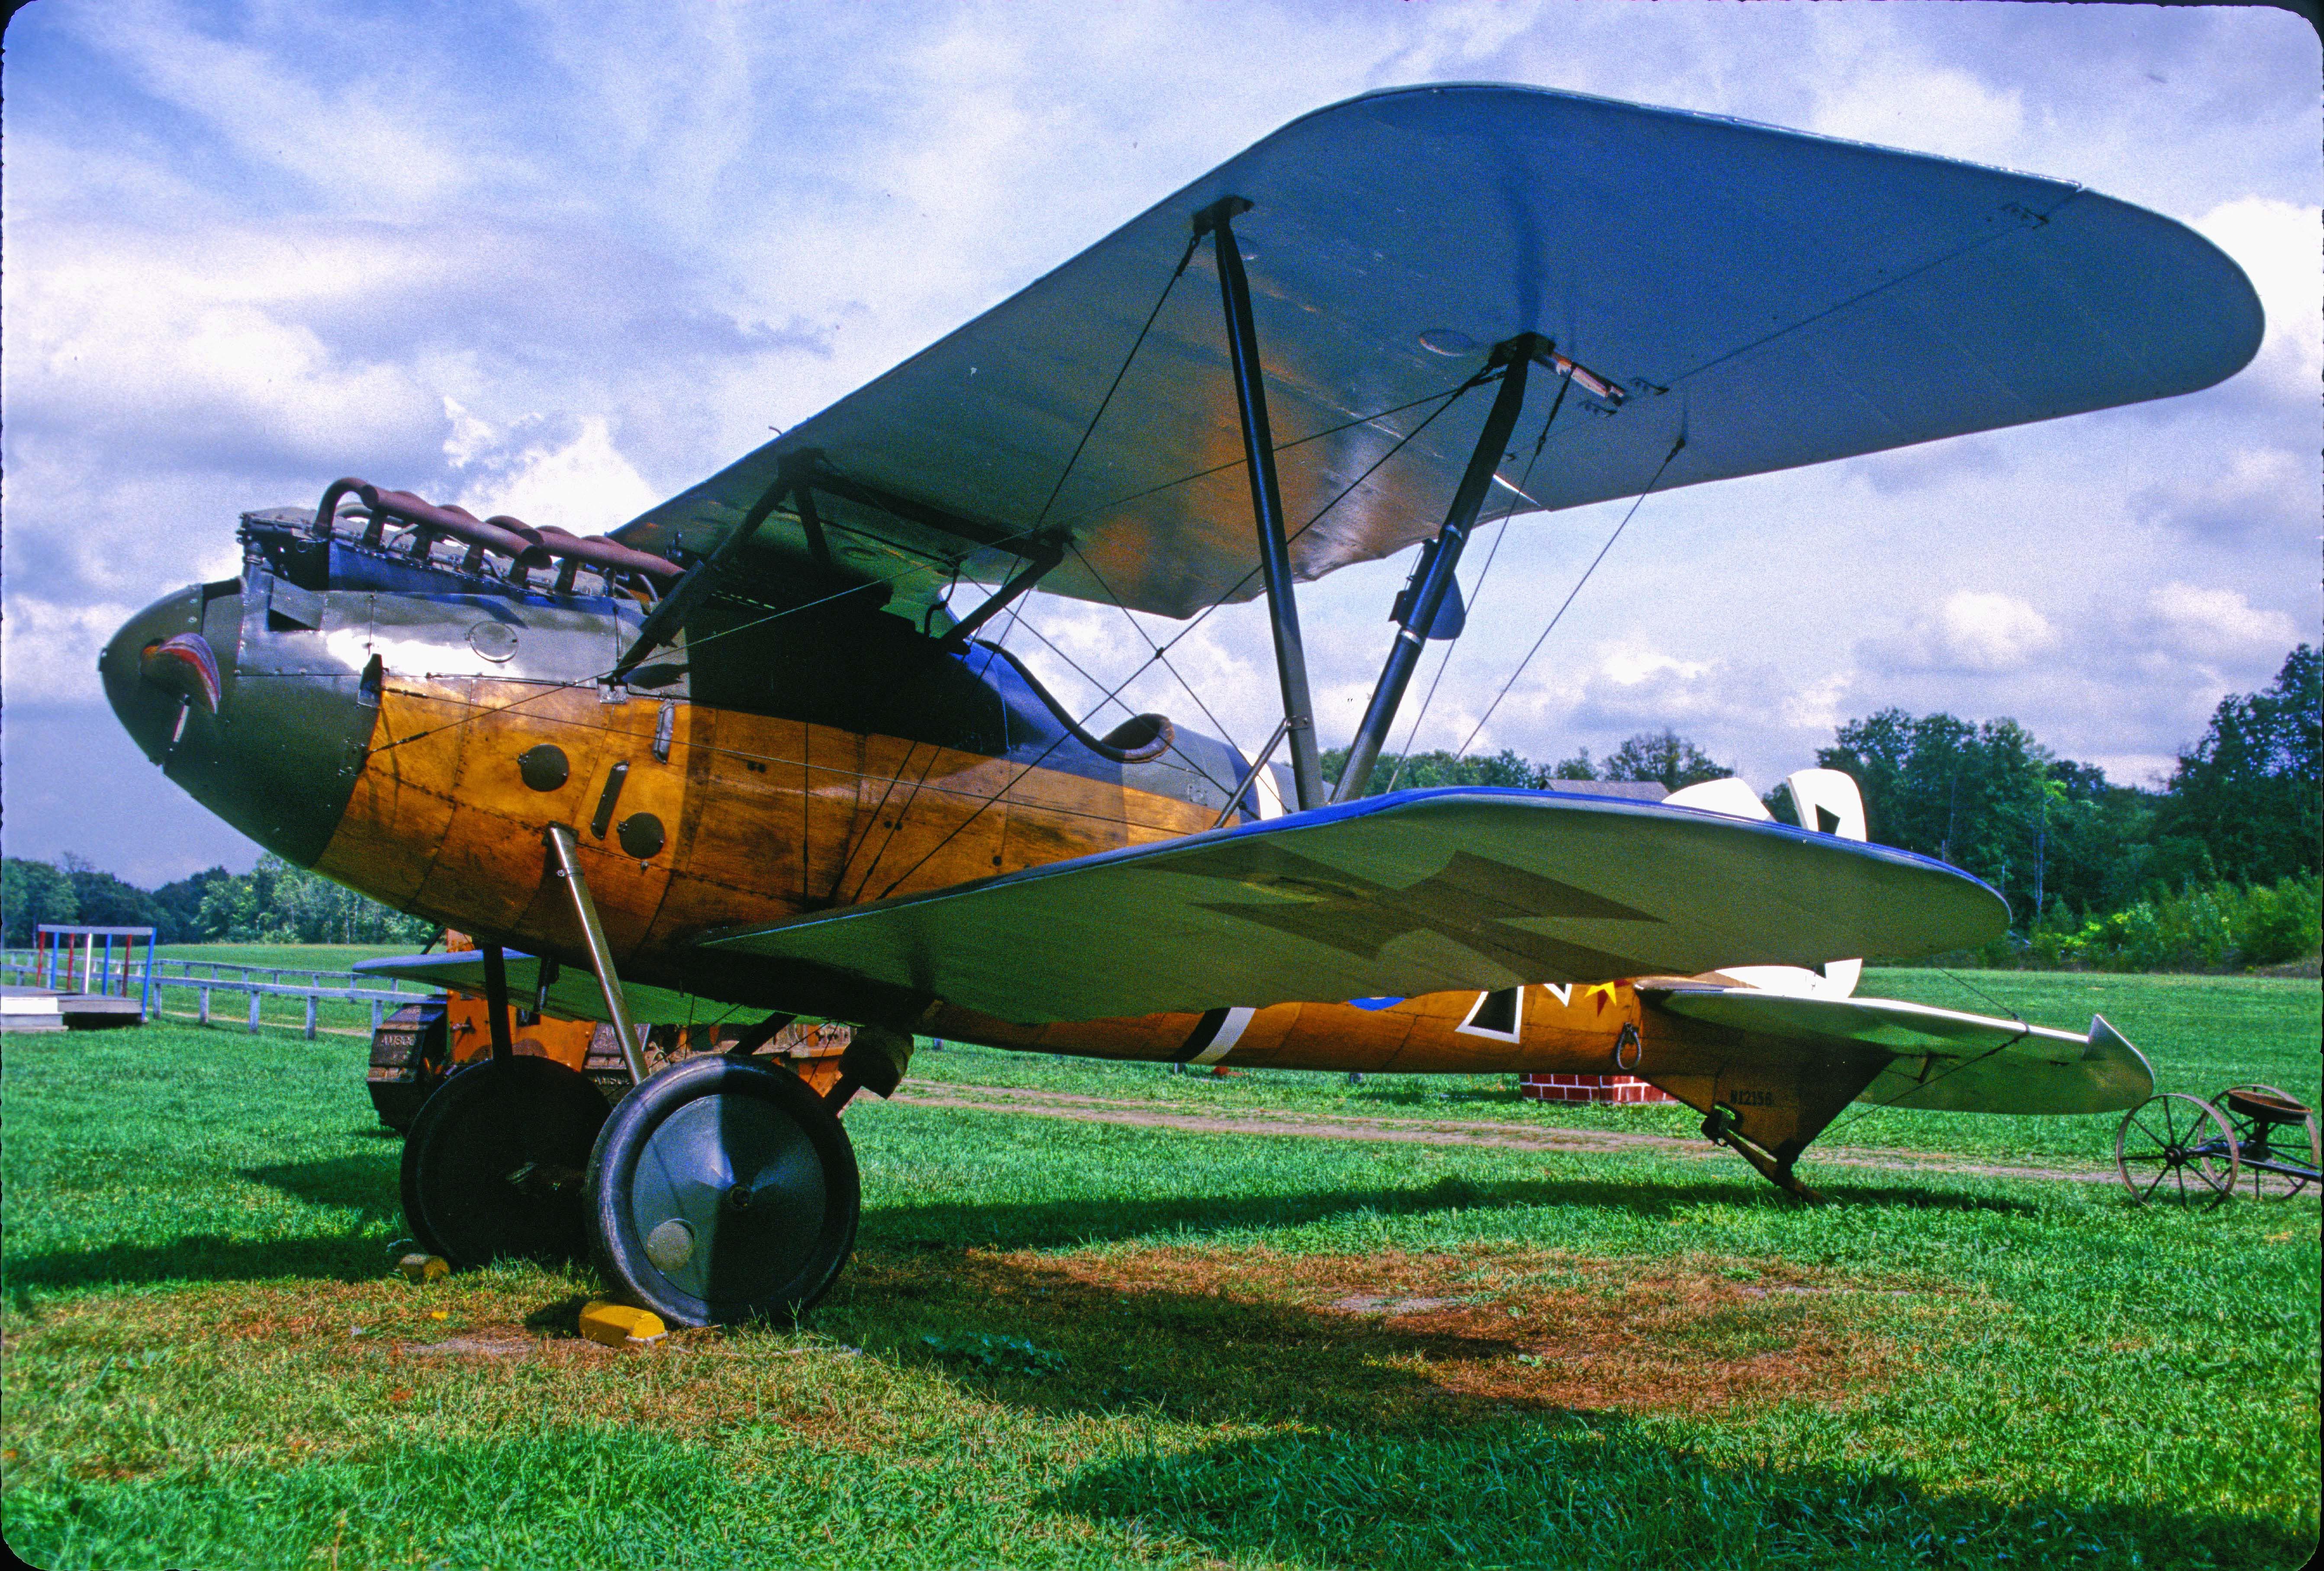 Air show | photobackstory